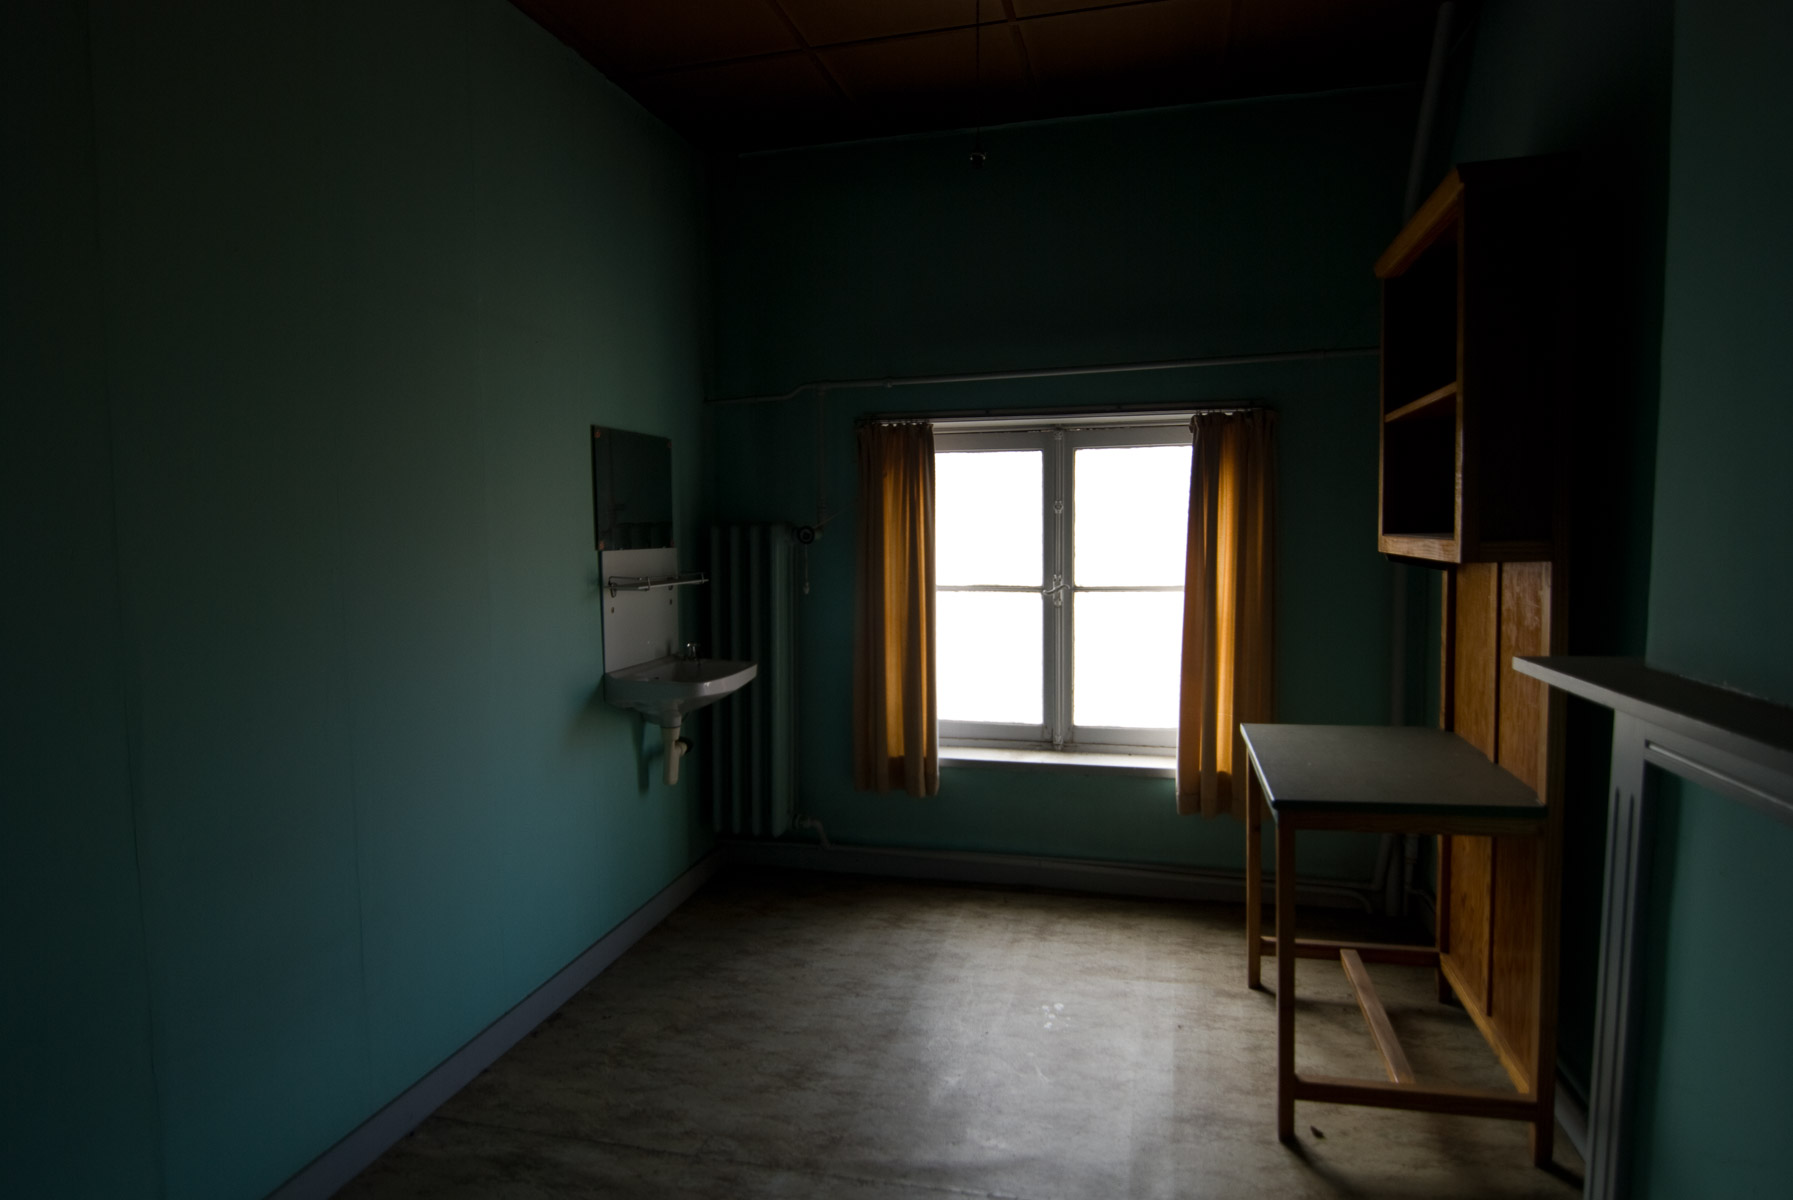 abandoned-places-in-belgium-alicia-rius-photography.jpg